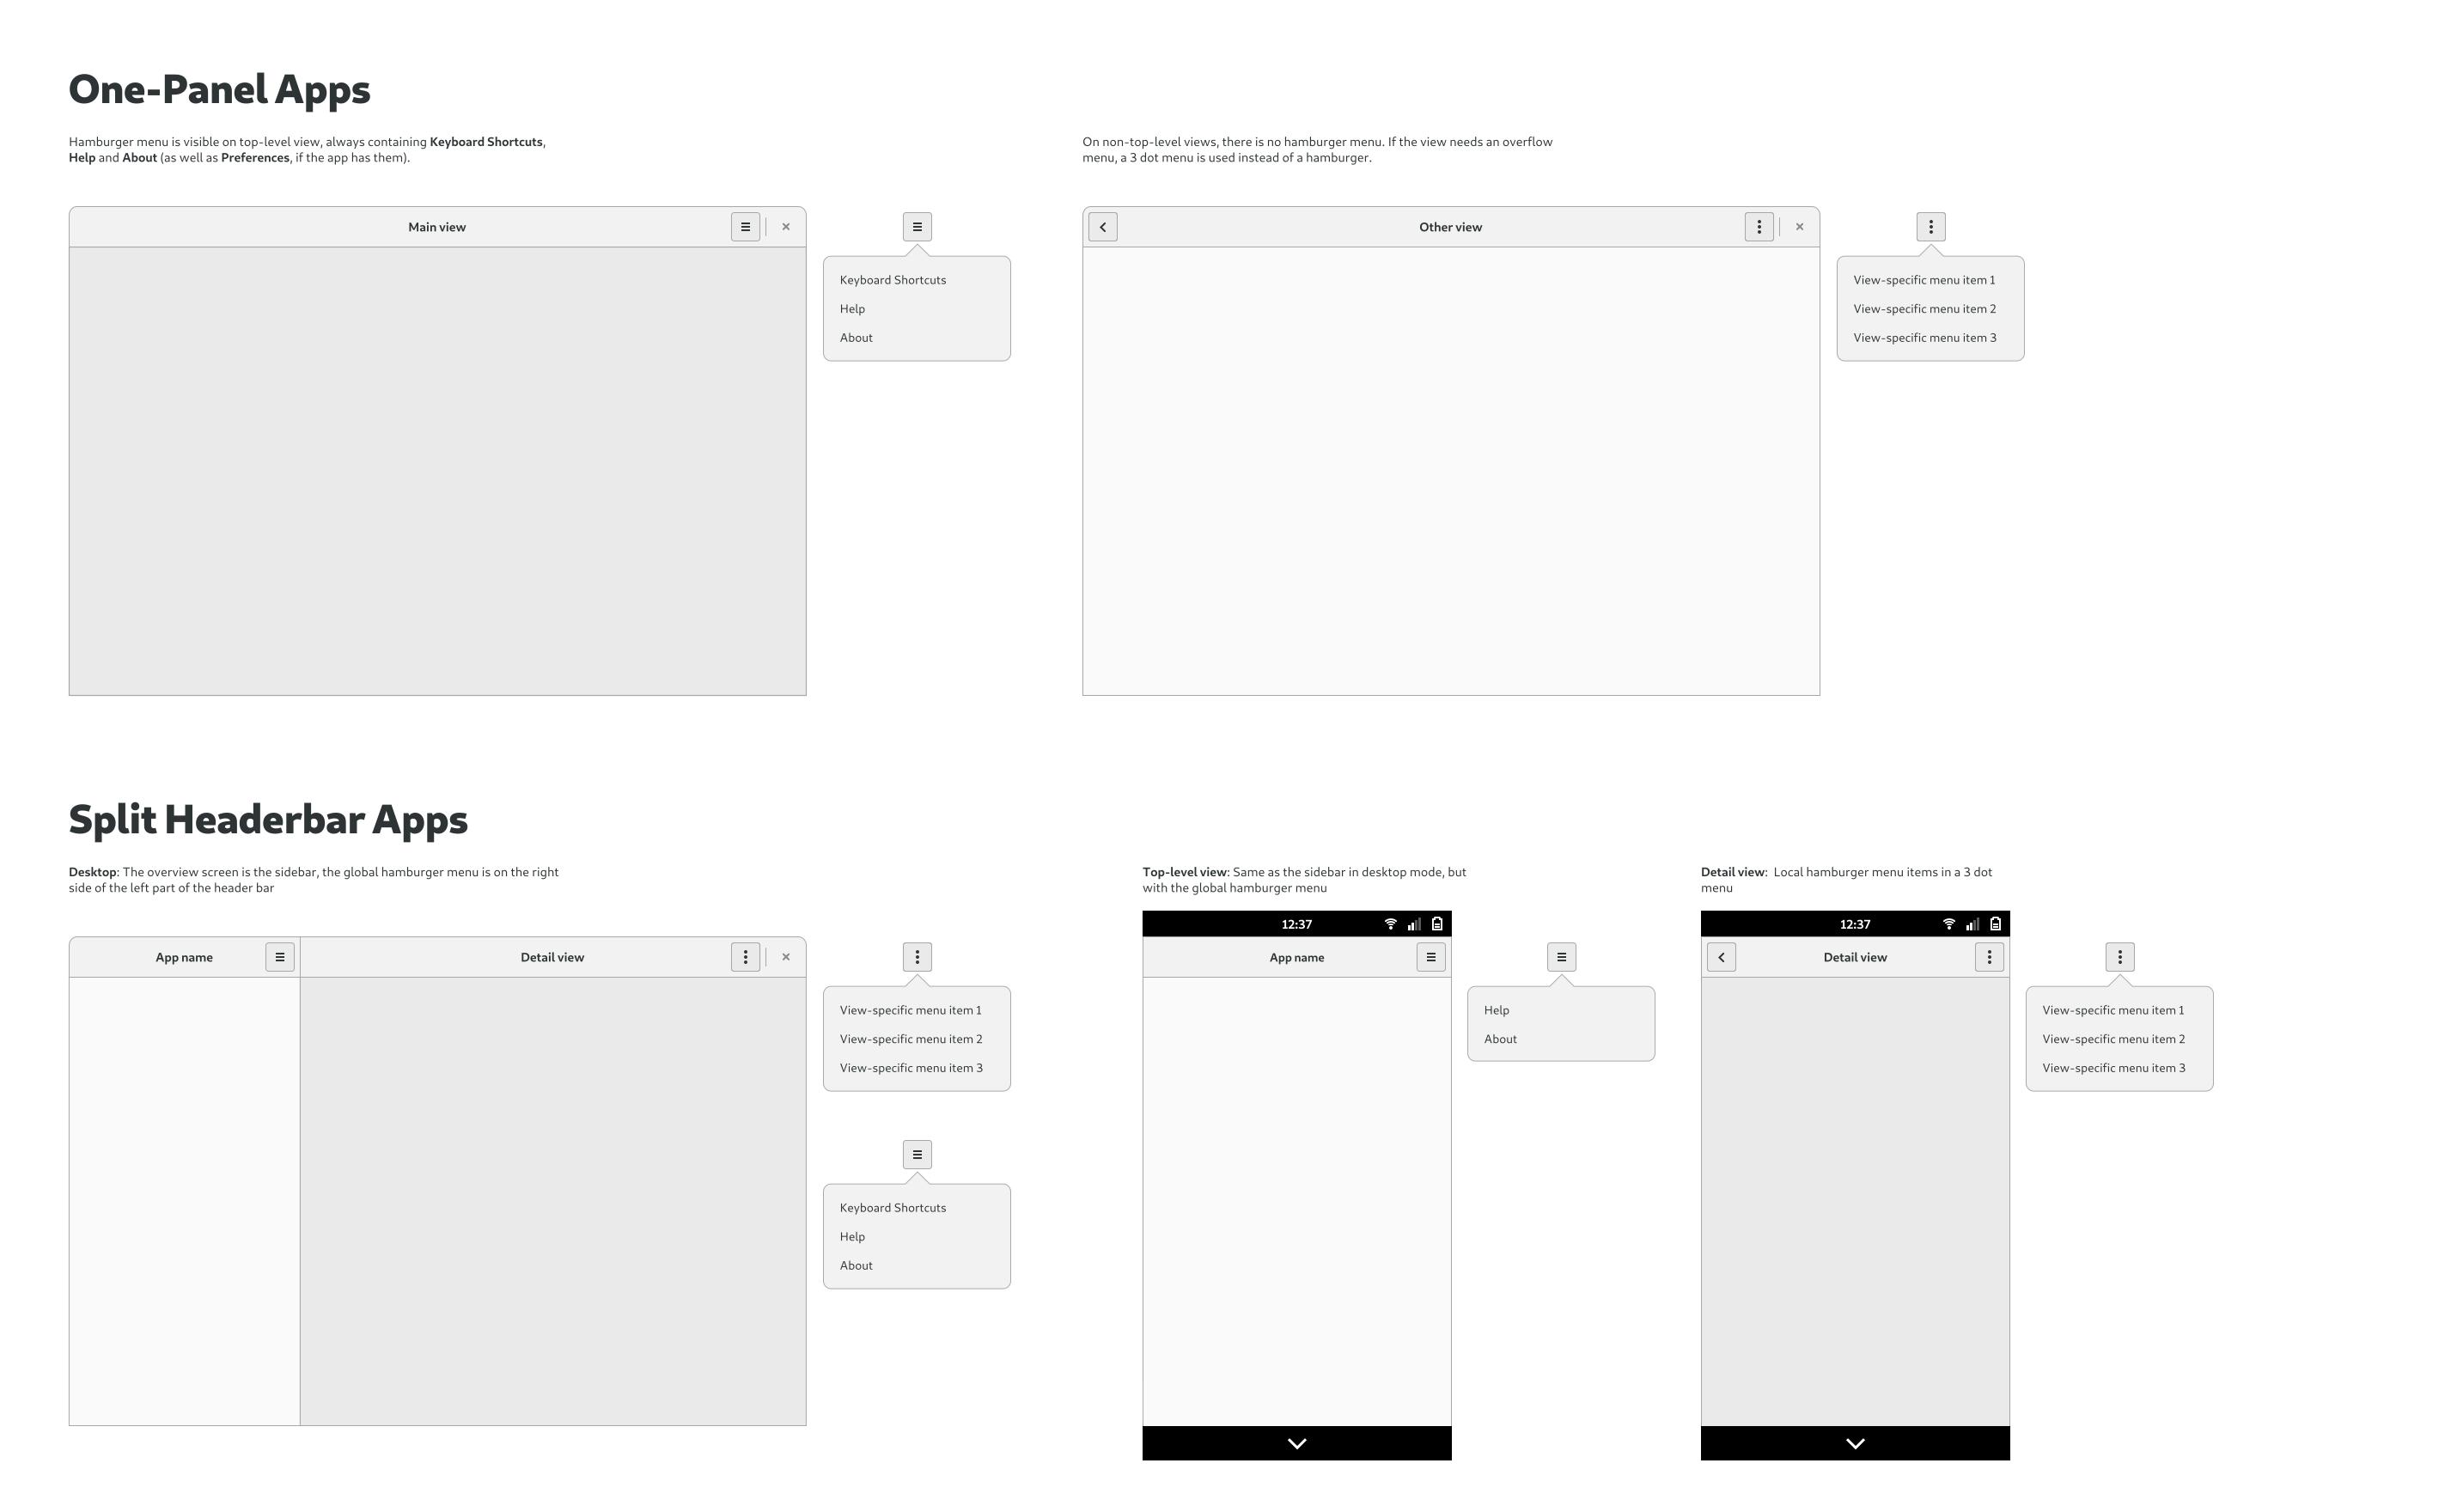 https://gitlab.gnome.org/Community/Design/os-mockups/raw/master/app-menu/patterns.png